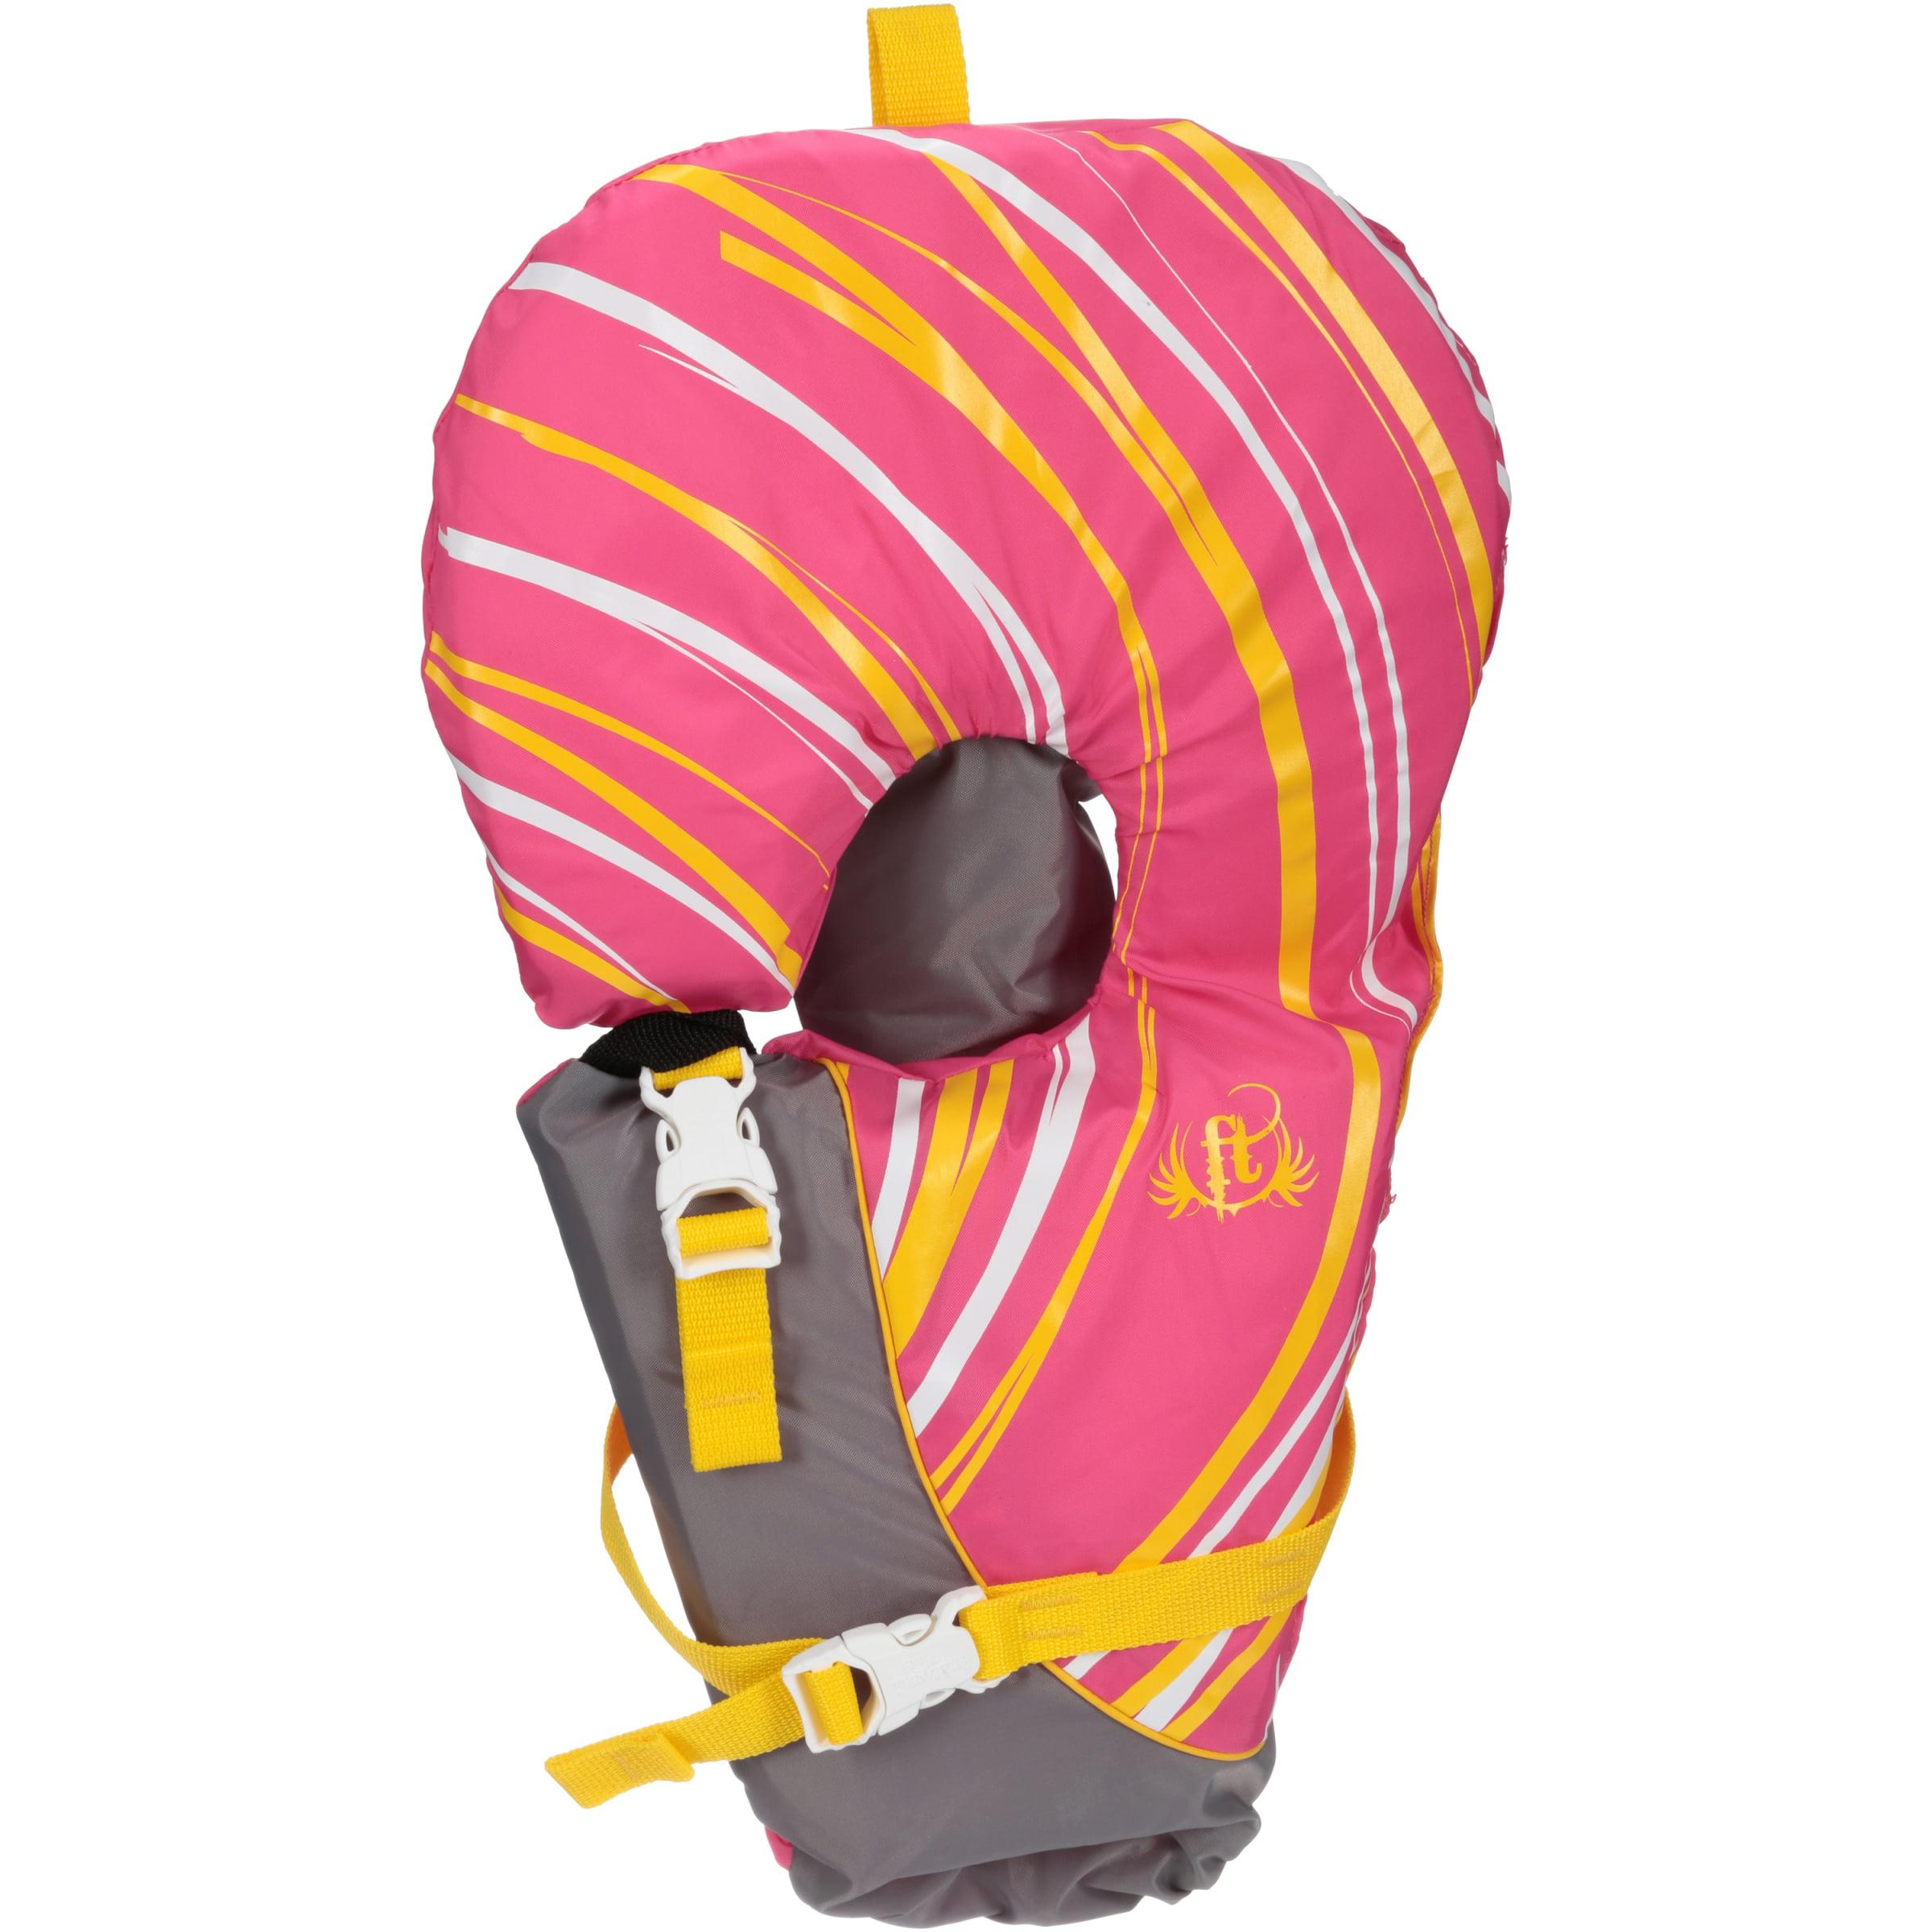 Full Throttle® Infant Personal Flotation Device